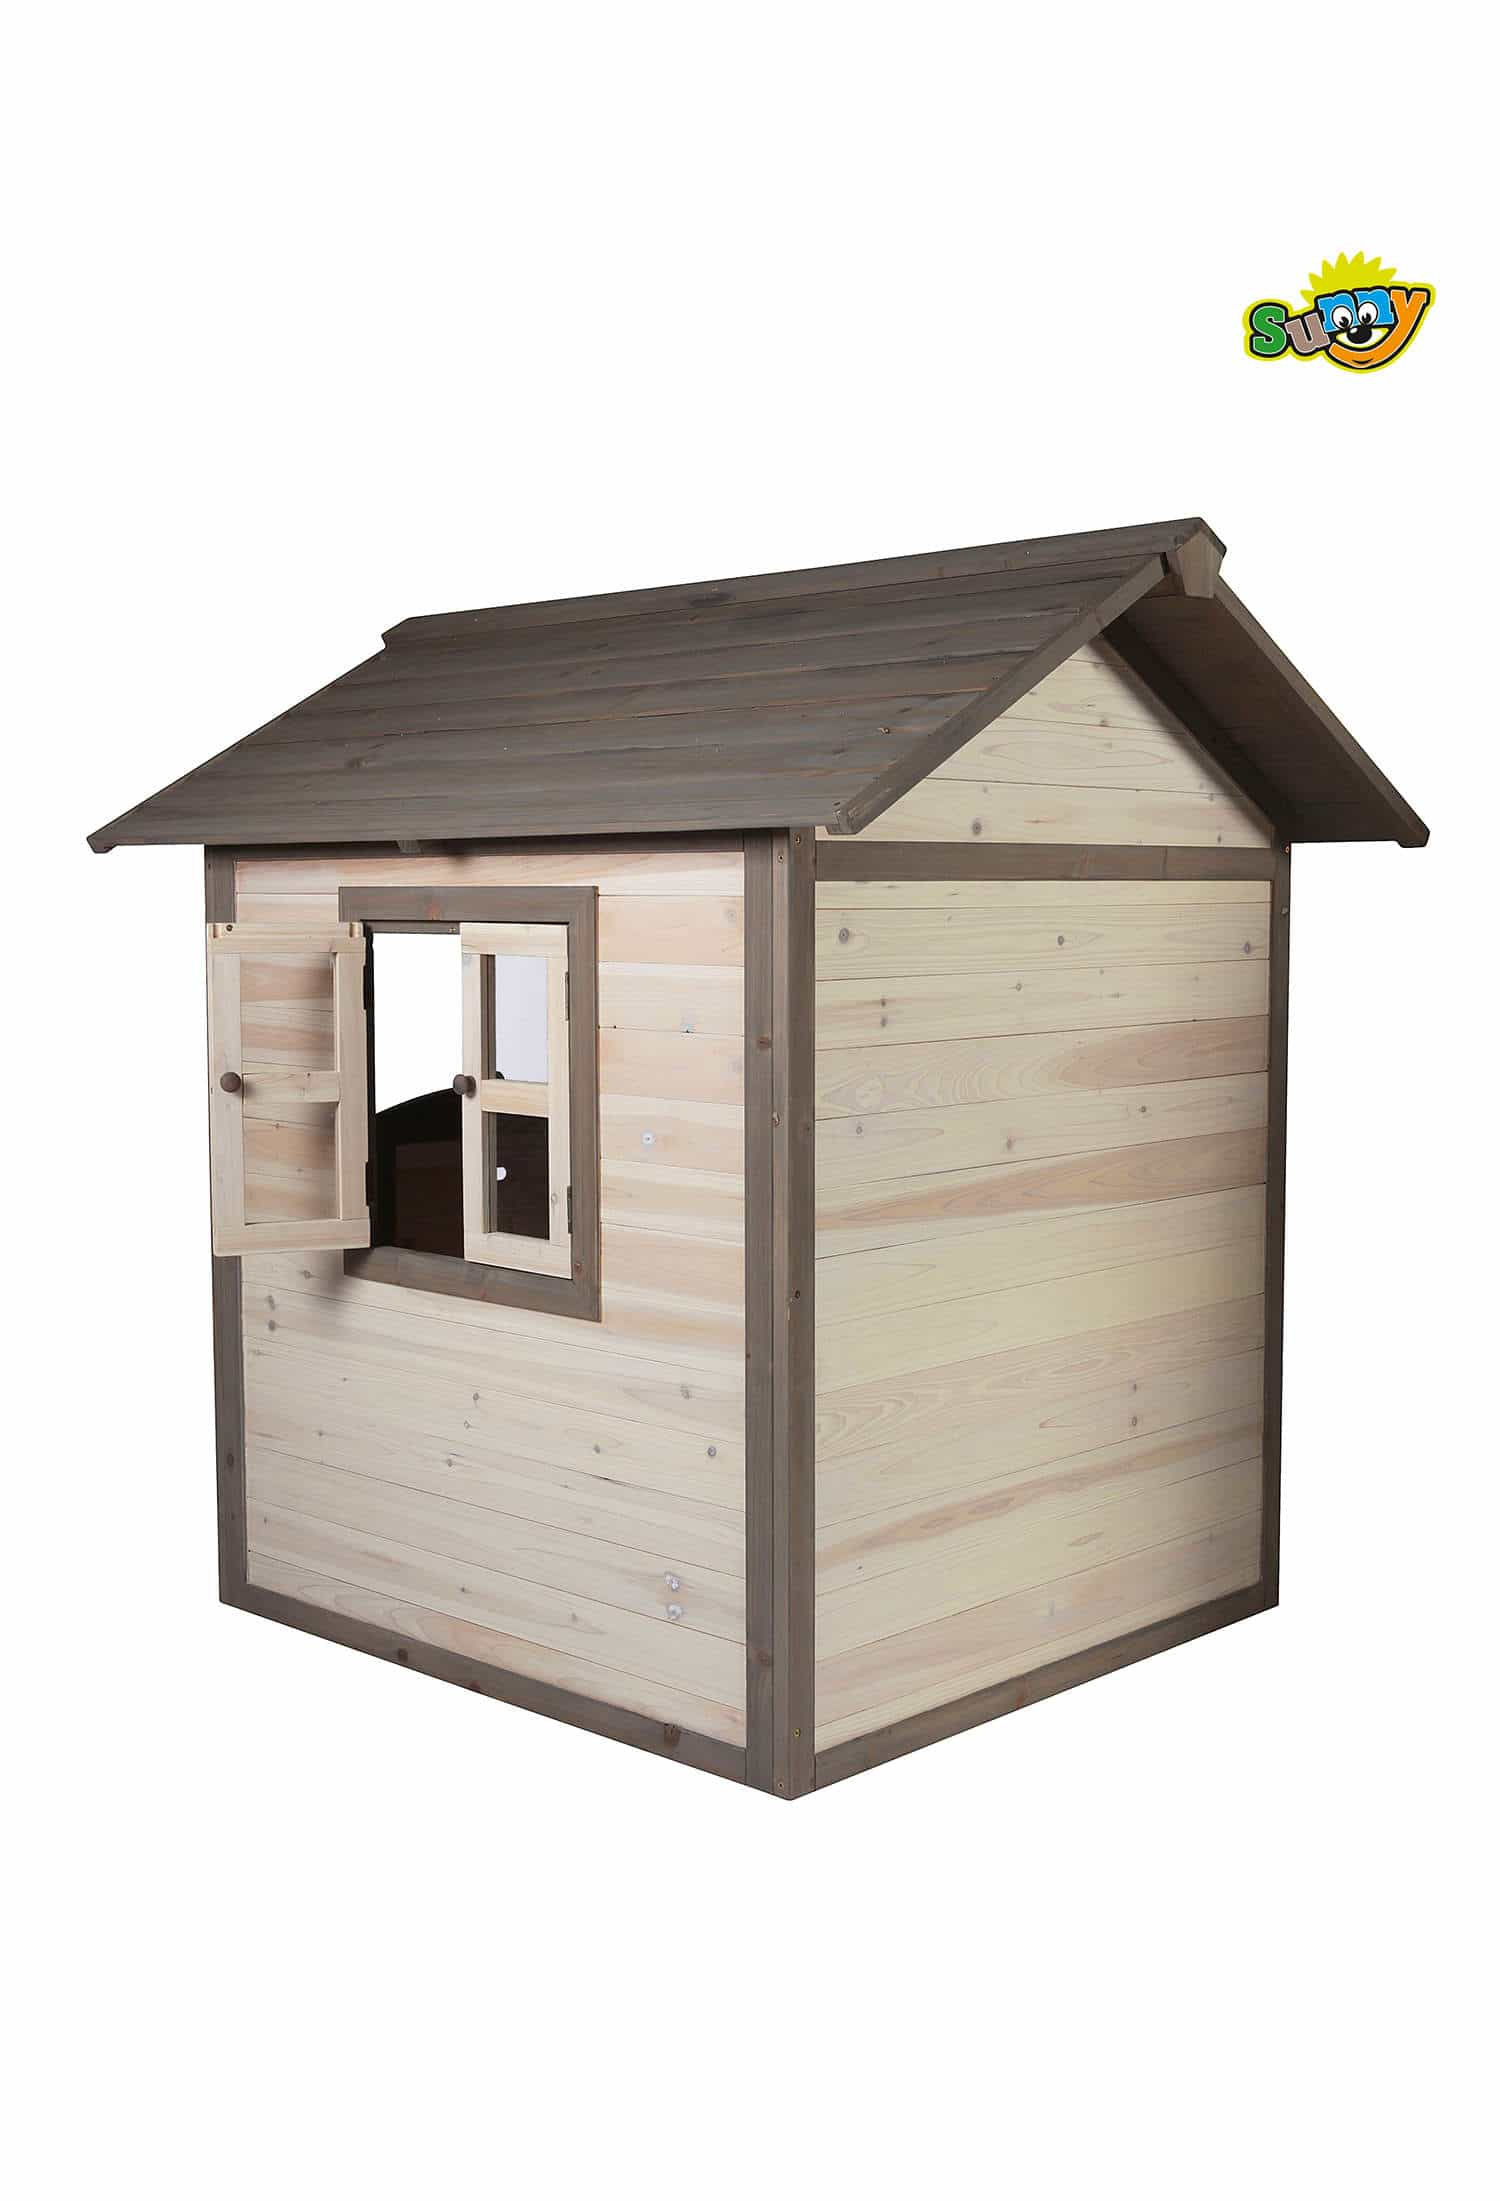 Sunny playhouse lodge garden furniture ireland outdoor for Outdoor furniture ireland